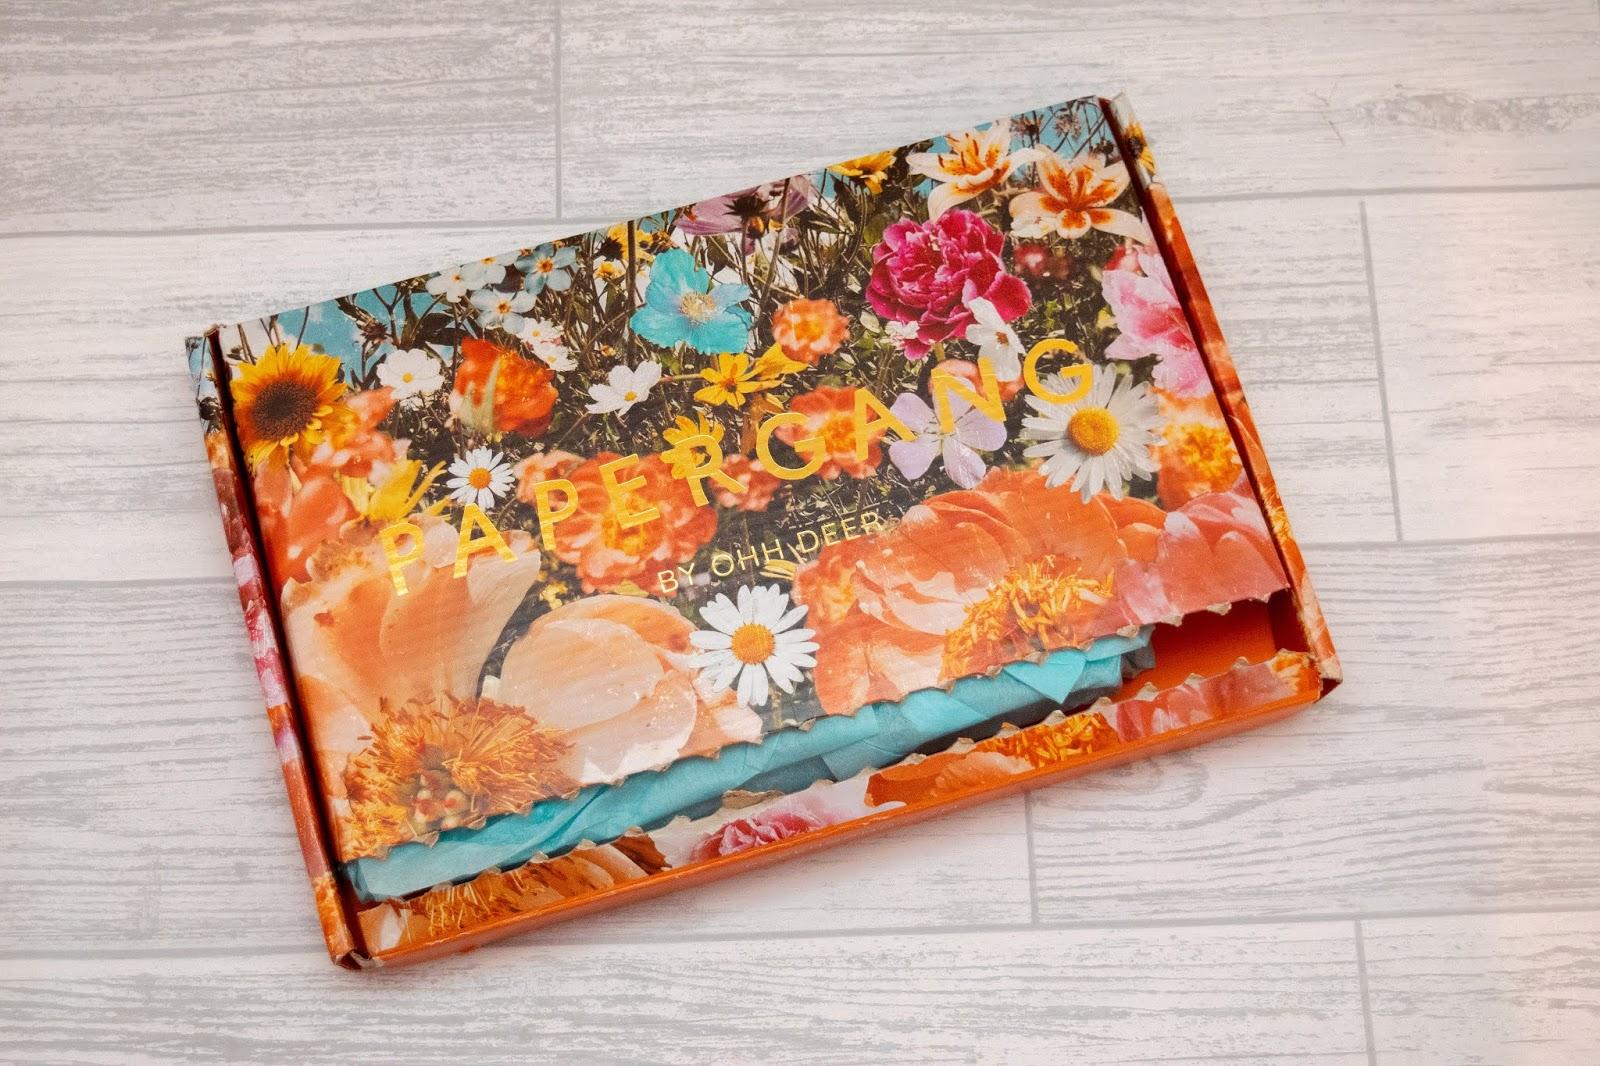 A retro floral postbox sized cardboard box.